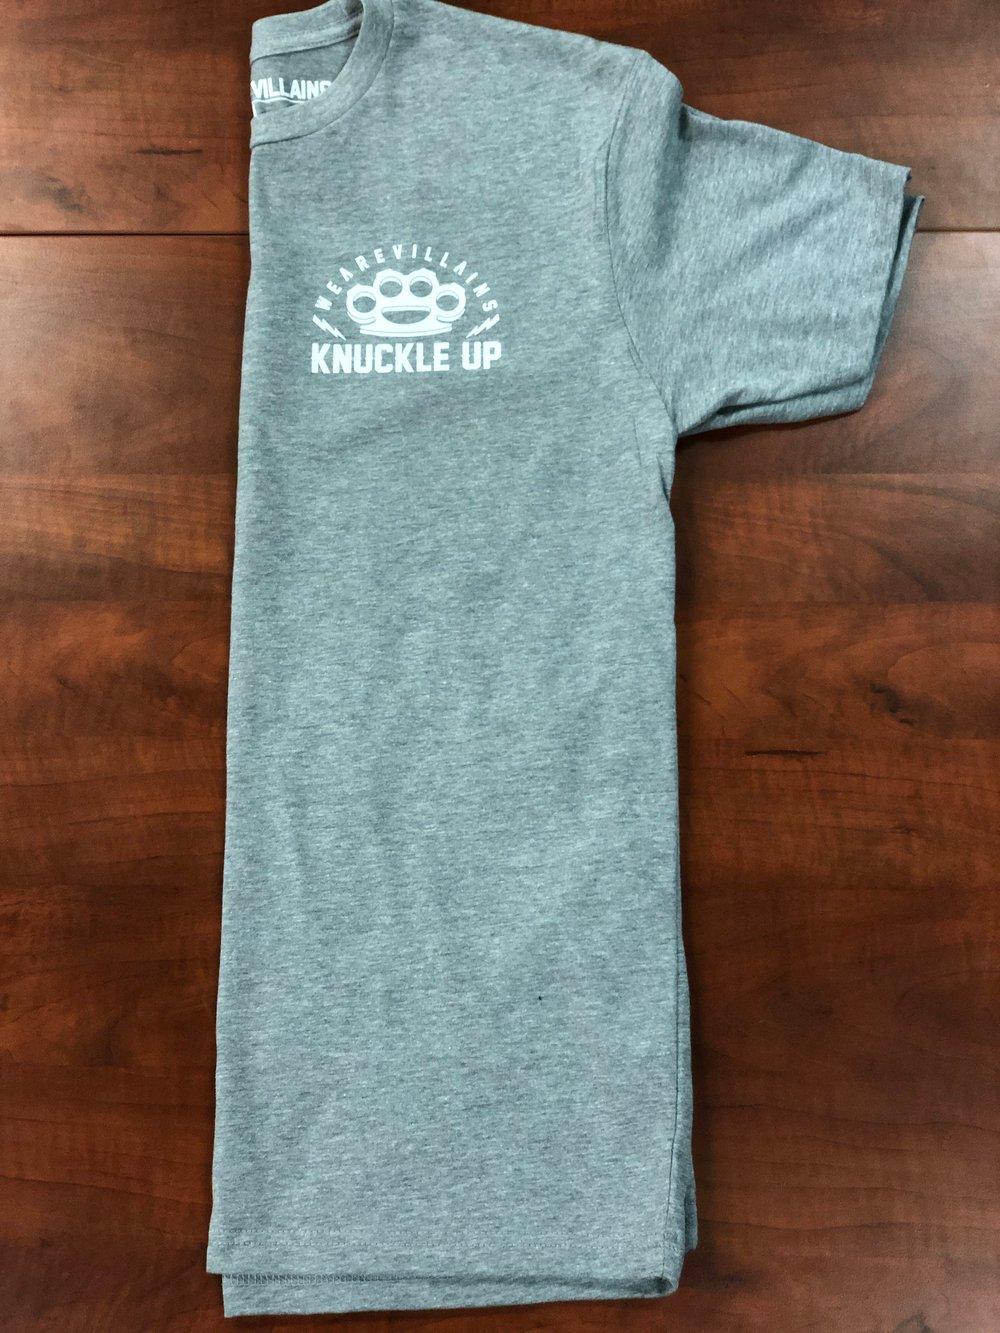 Knuckle Up grey tee